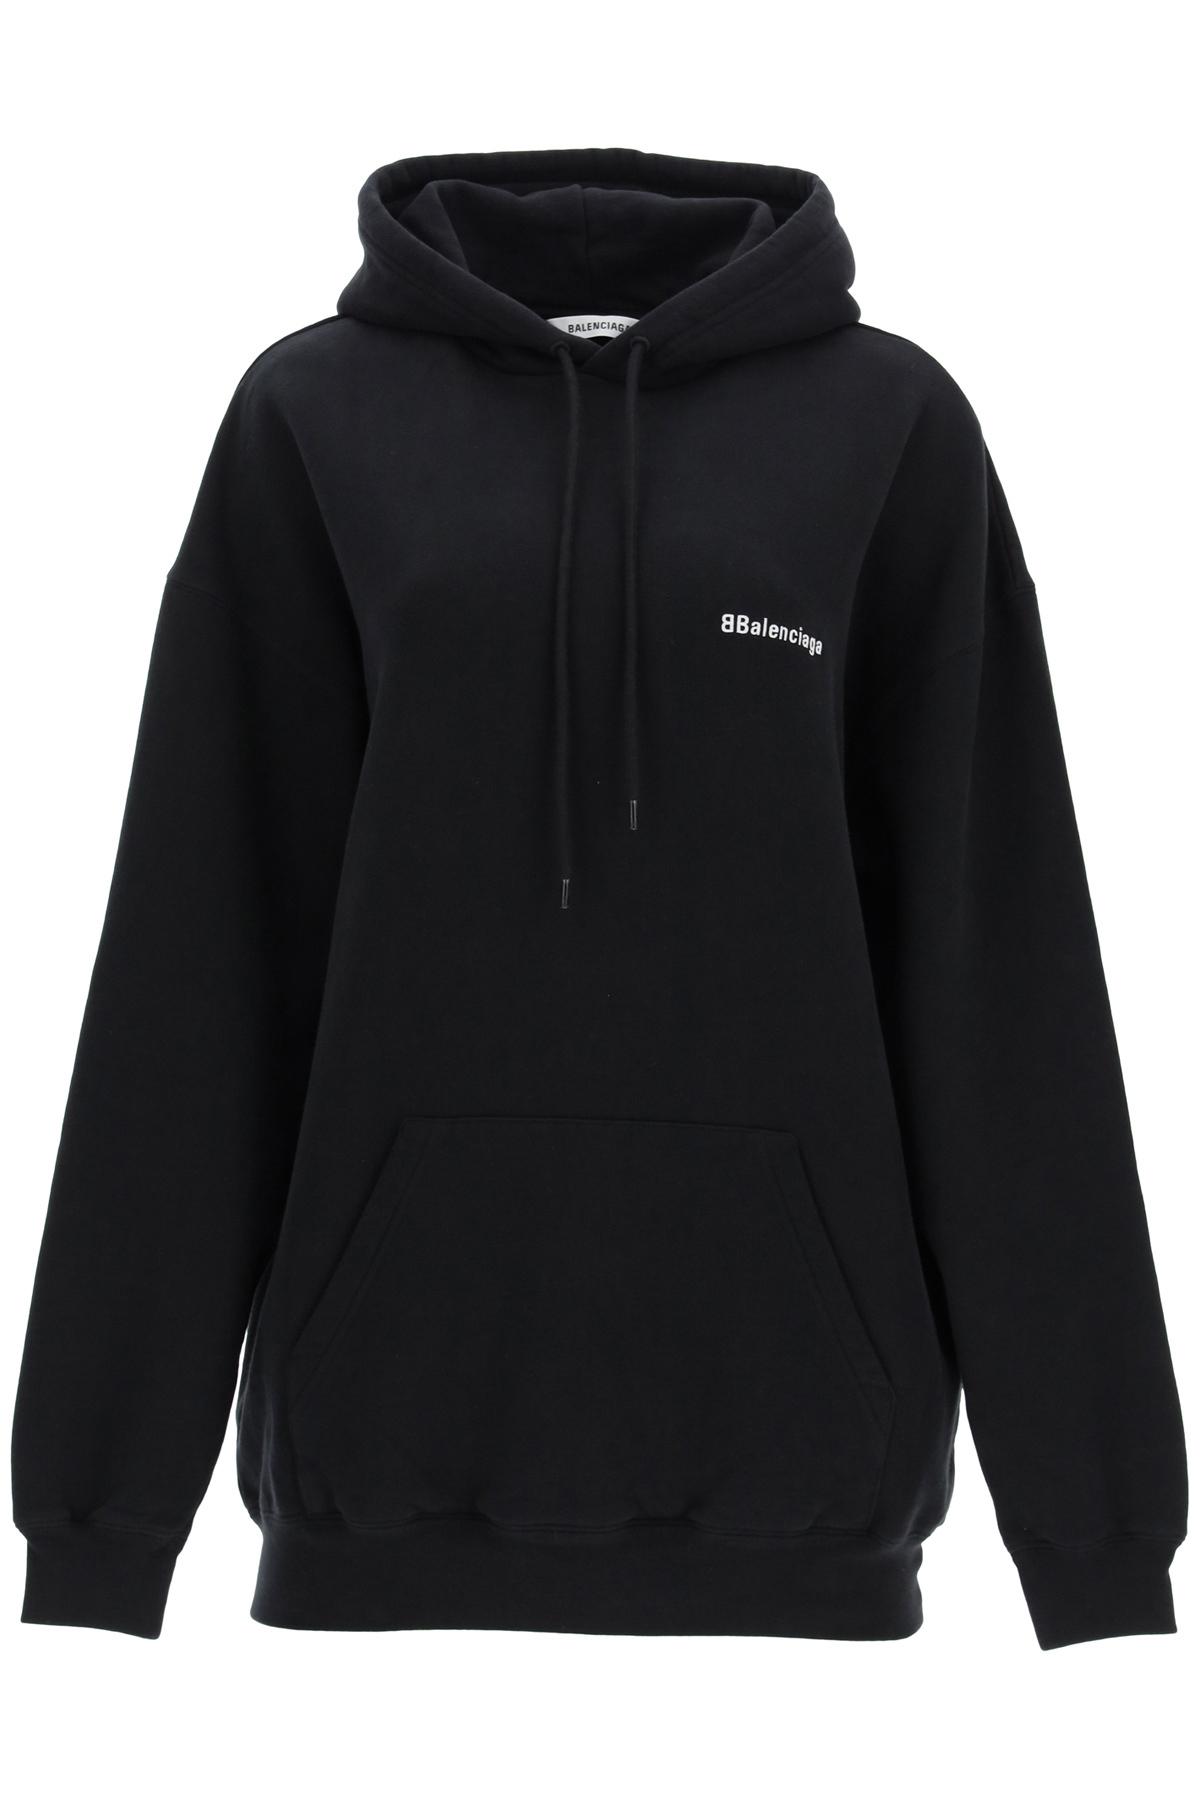 Balenciaga oversized sweatshirt with logo embroidery